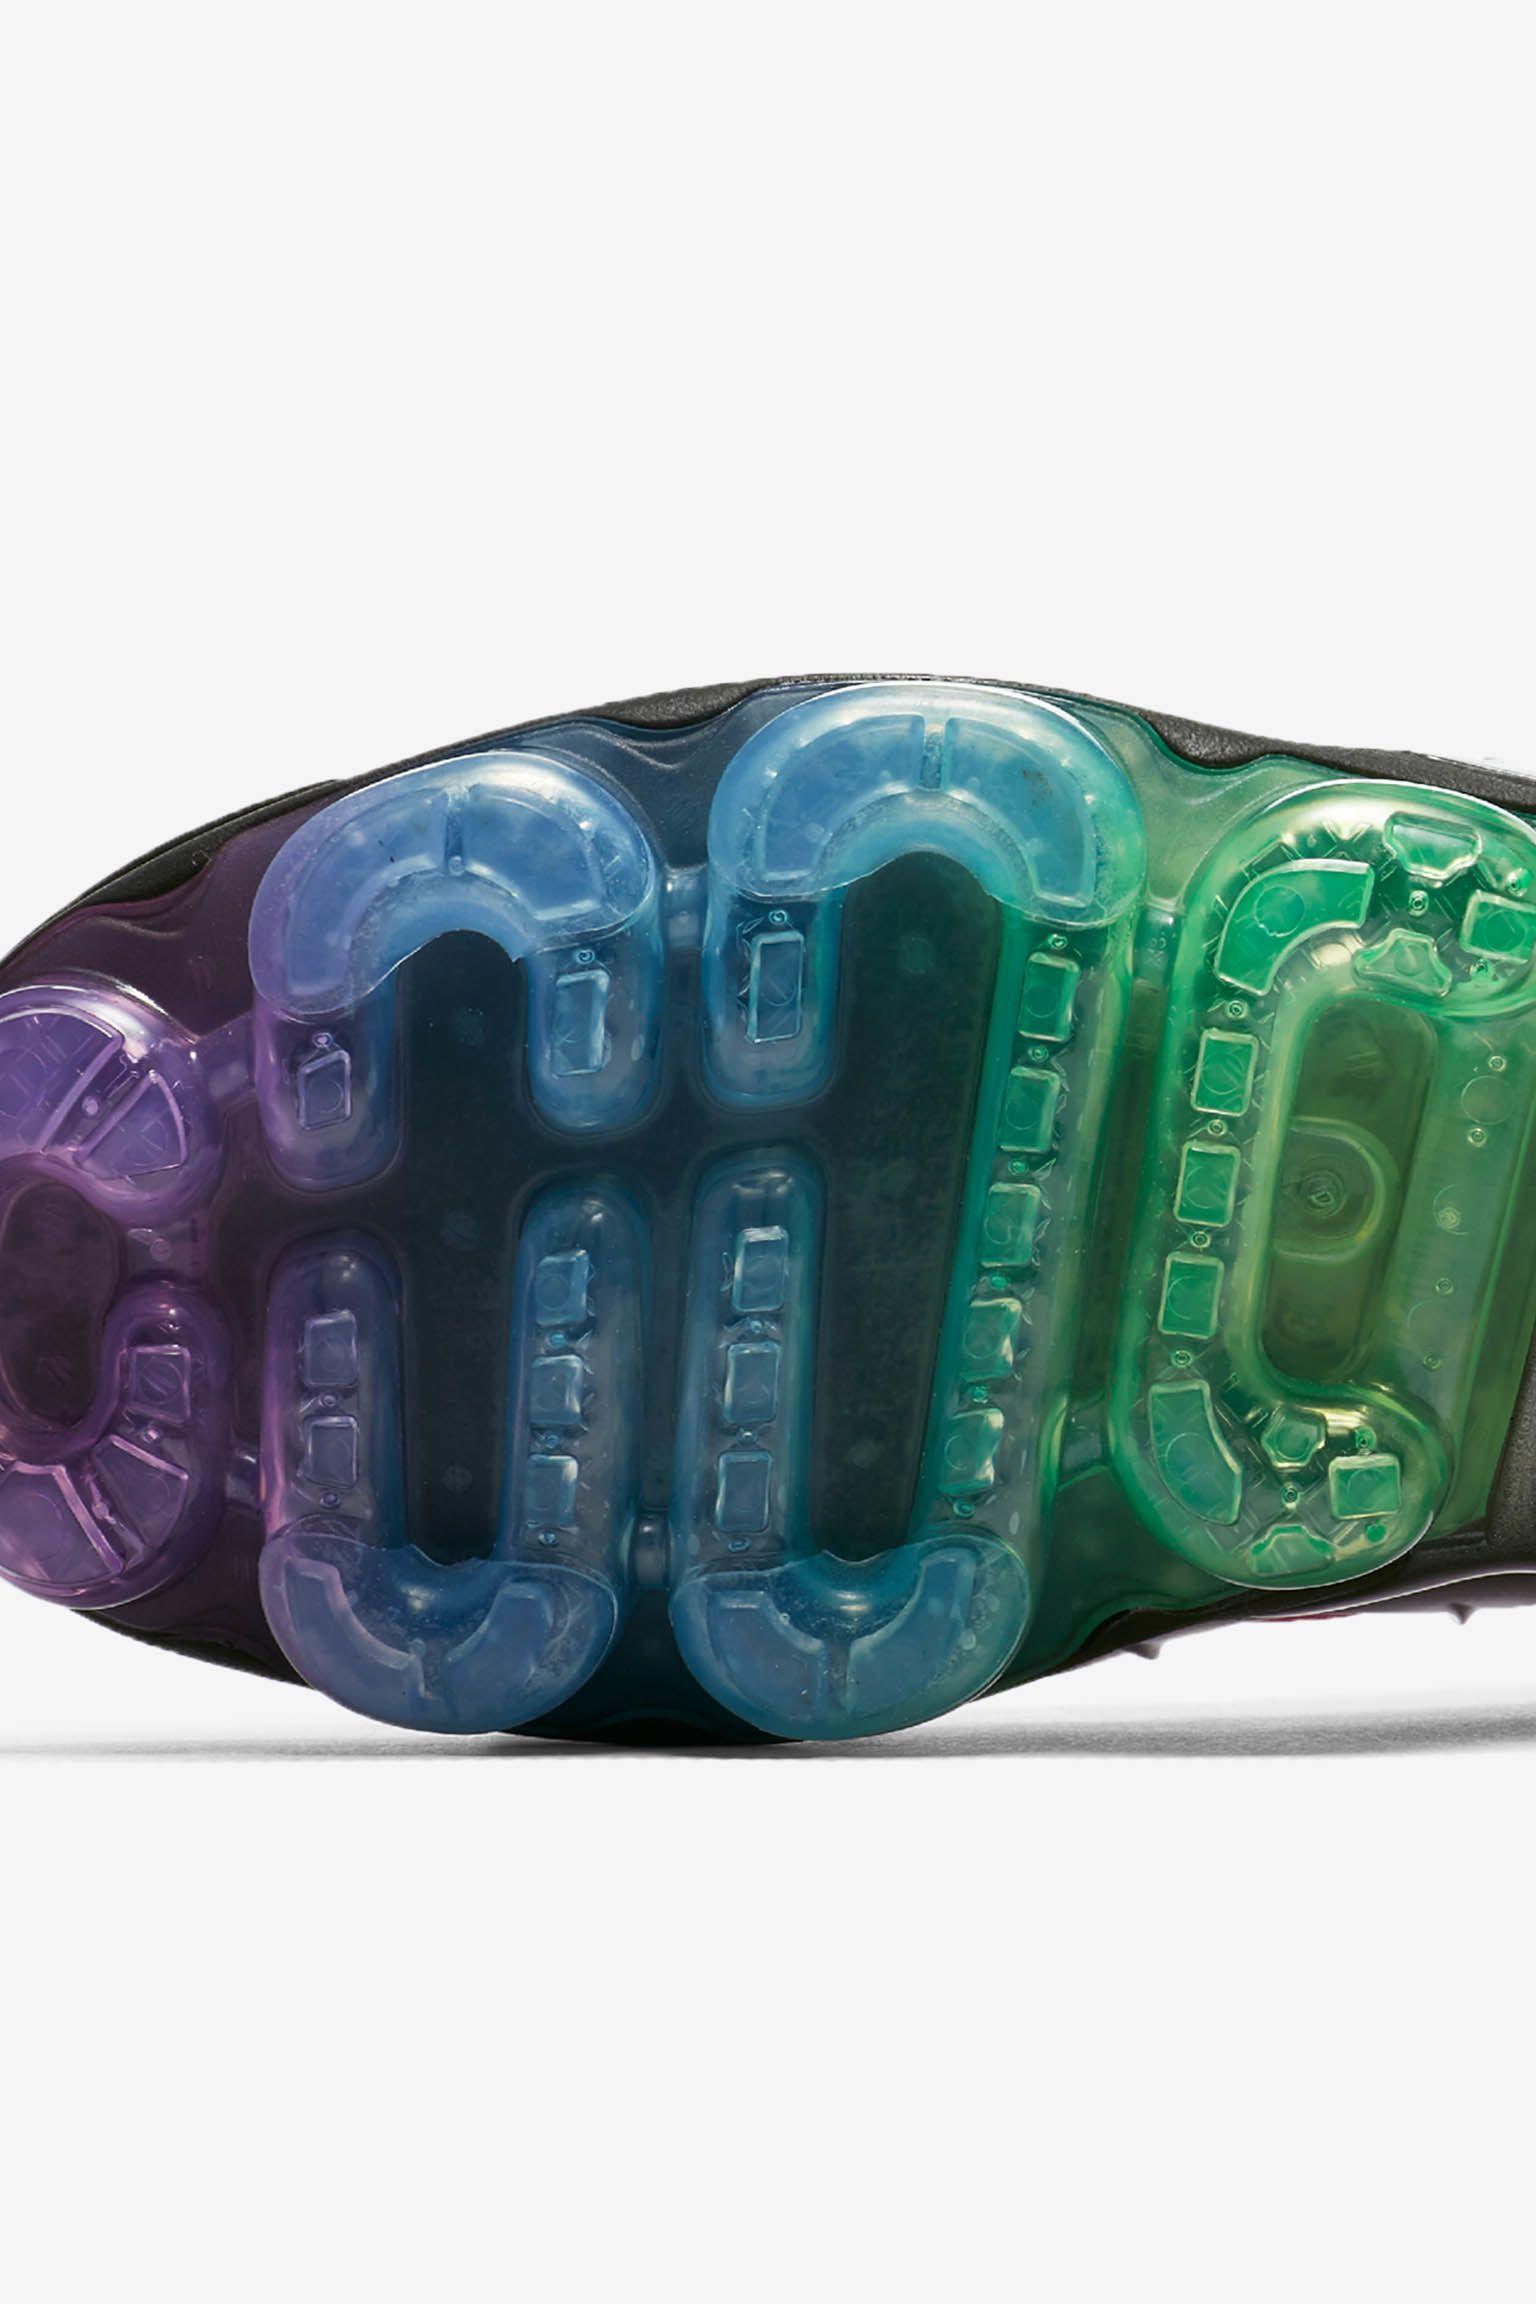 Nike Air Vapormax Plus Betrue 'Black & Multicolor' Release Date